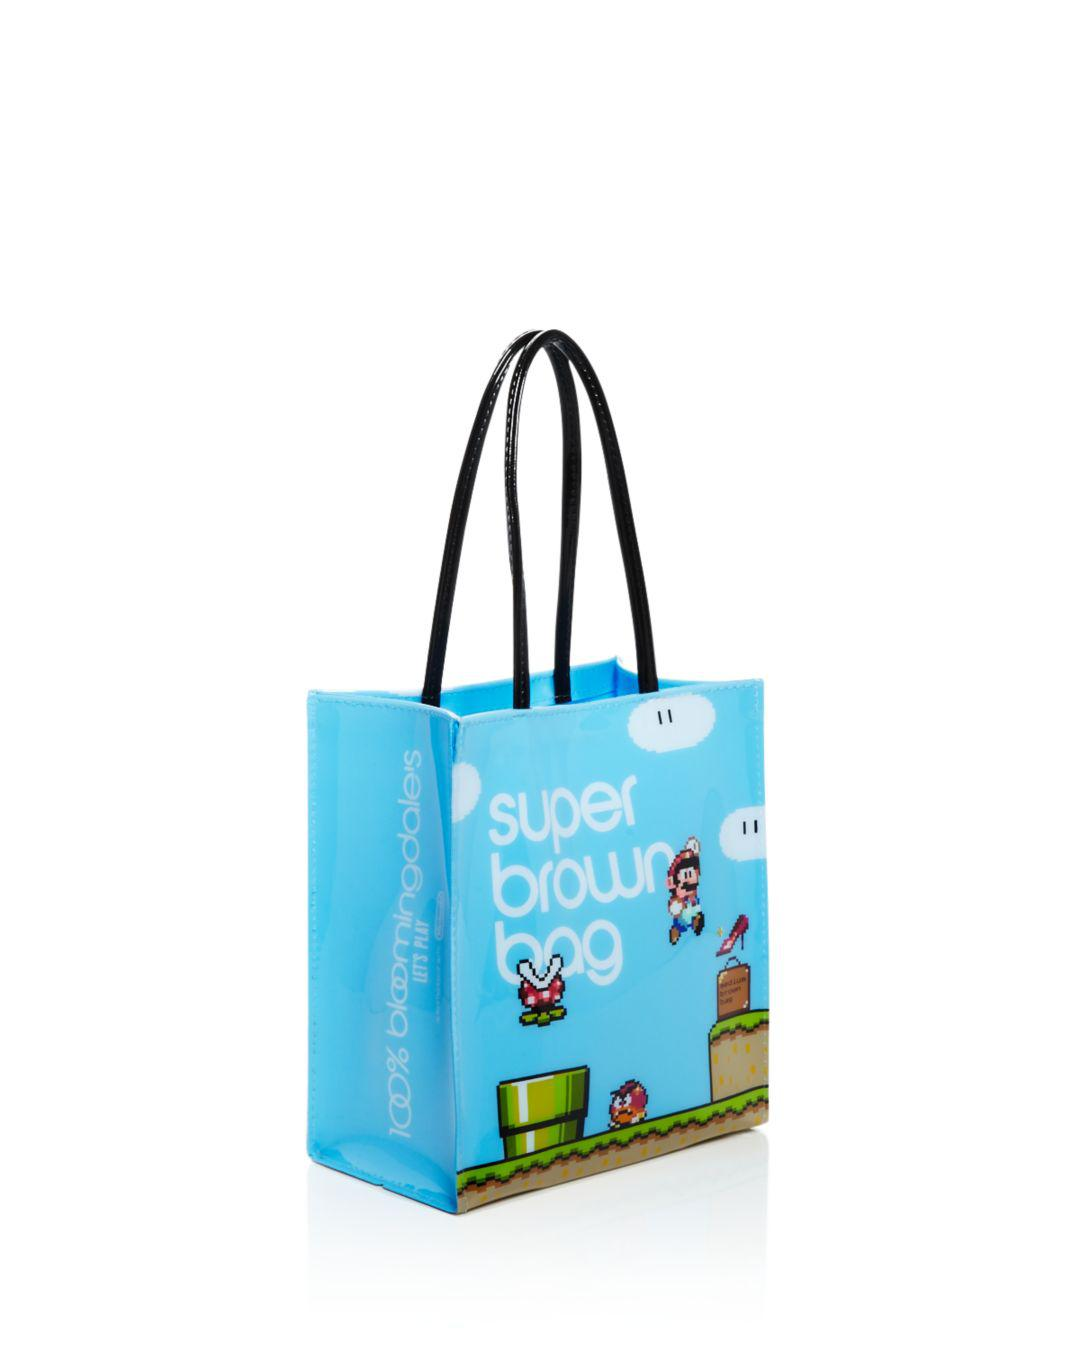 743a6b083 Bloomingdale's Nintendo Super Mario Tote in Blue - Lyst